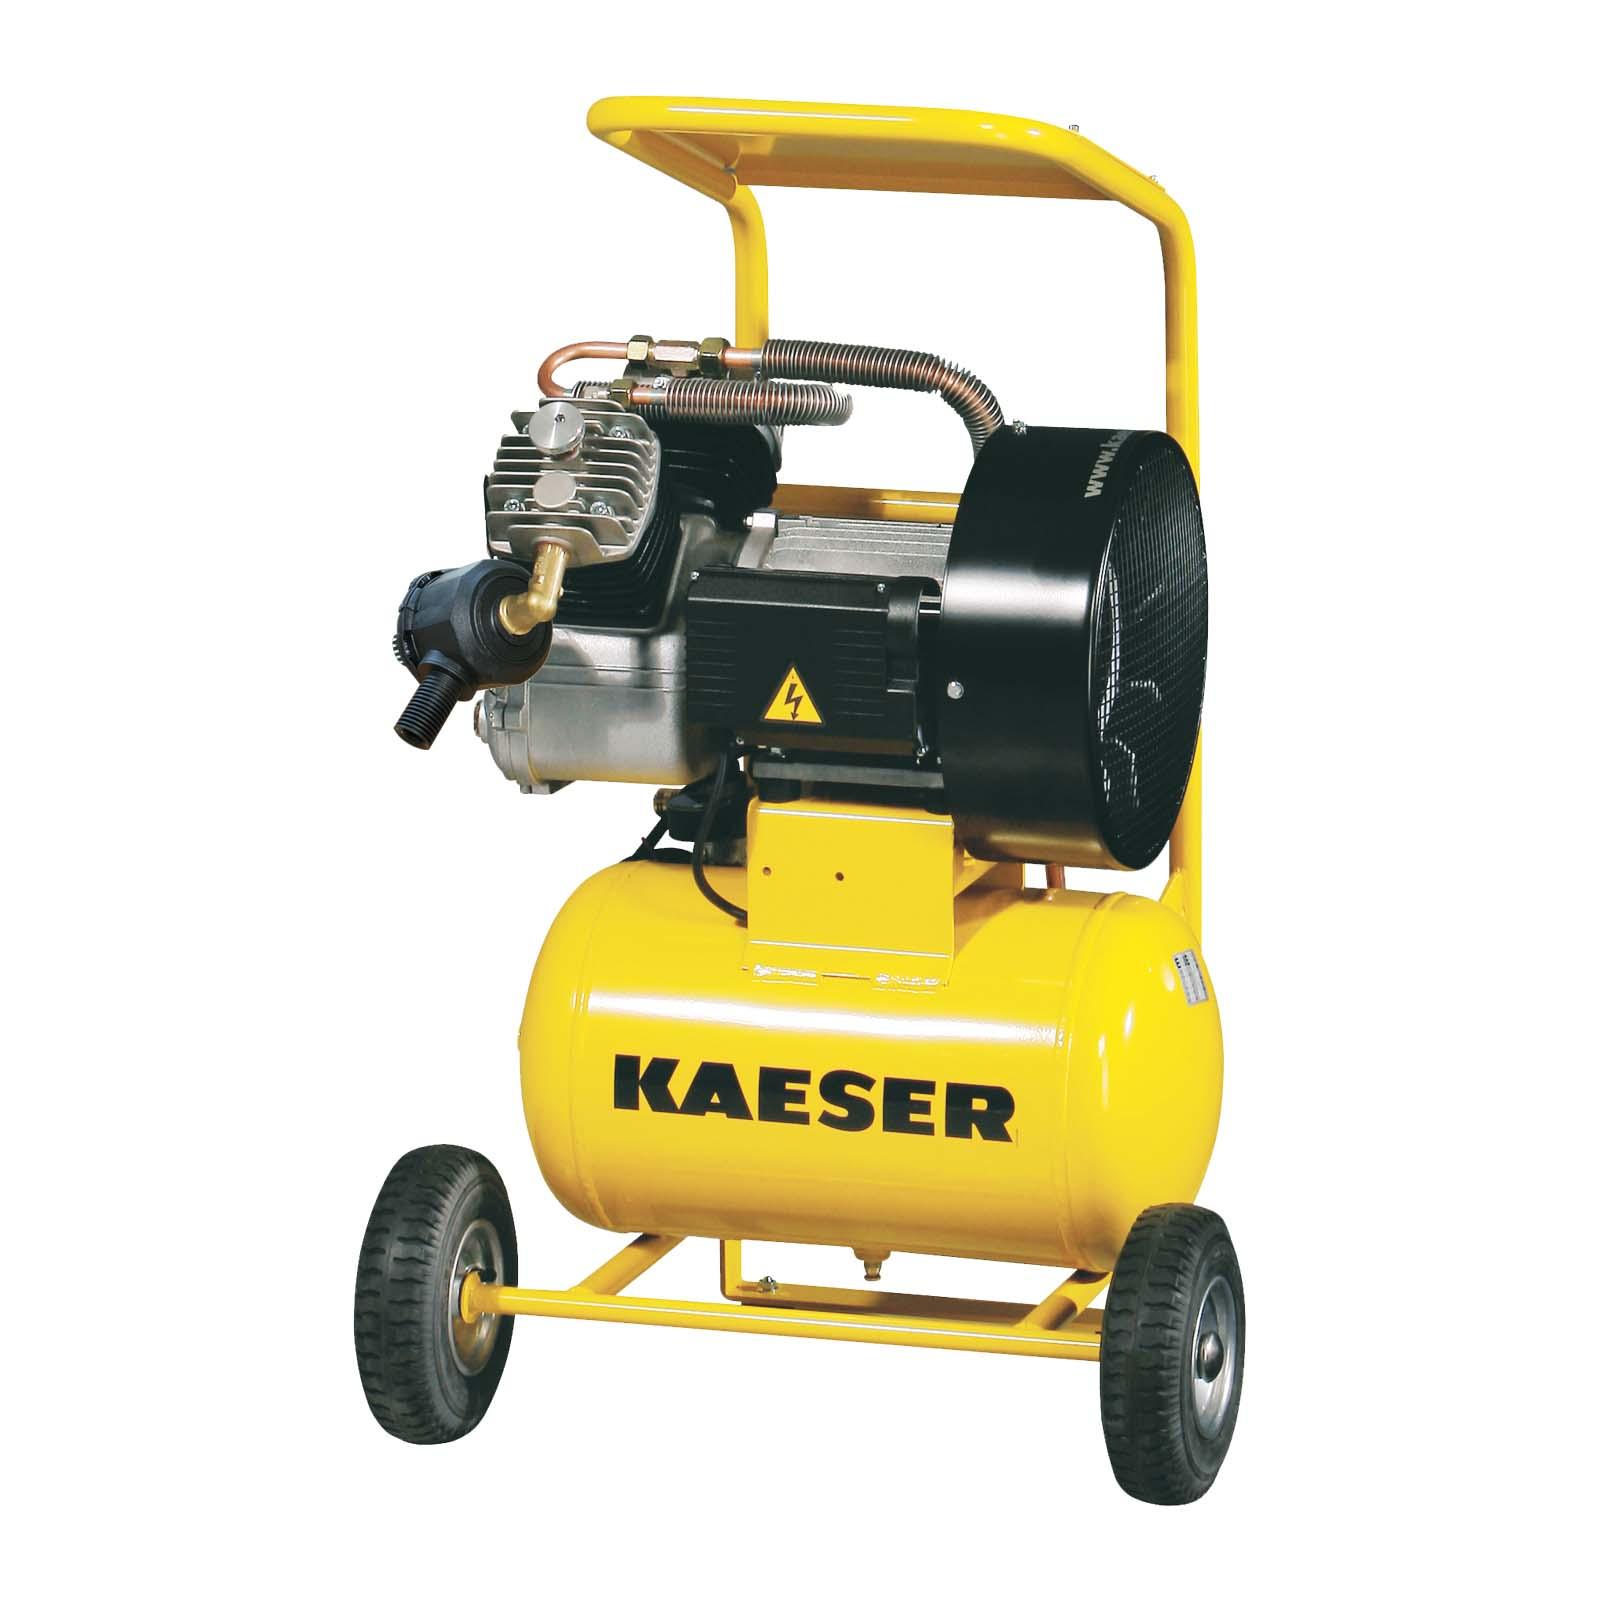 KAESER Premium Compakt 400/30 PW 2 Kolben Pico Papierluftfilter